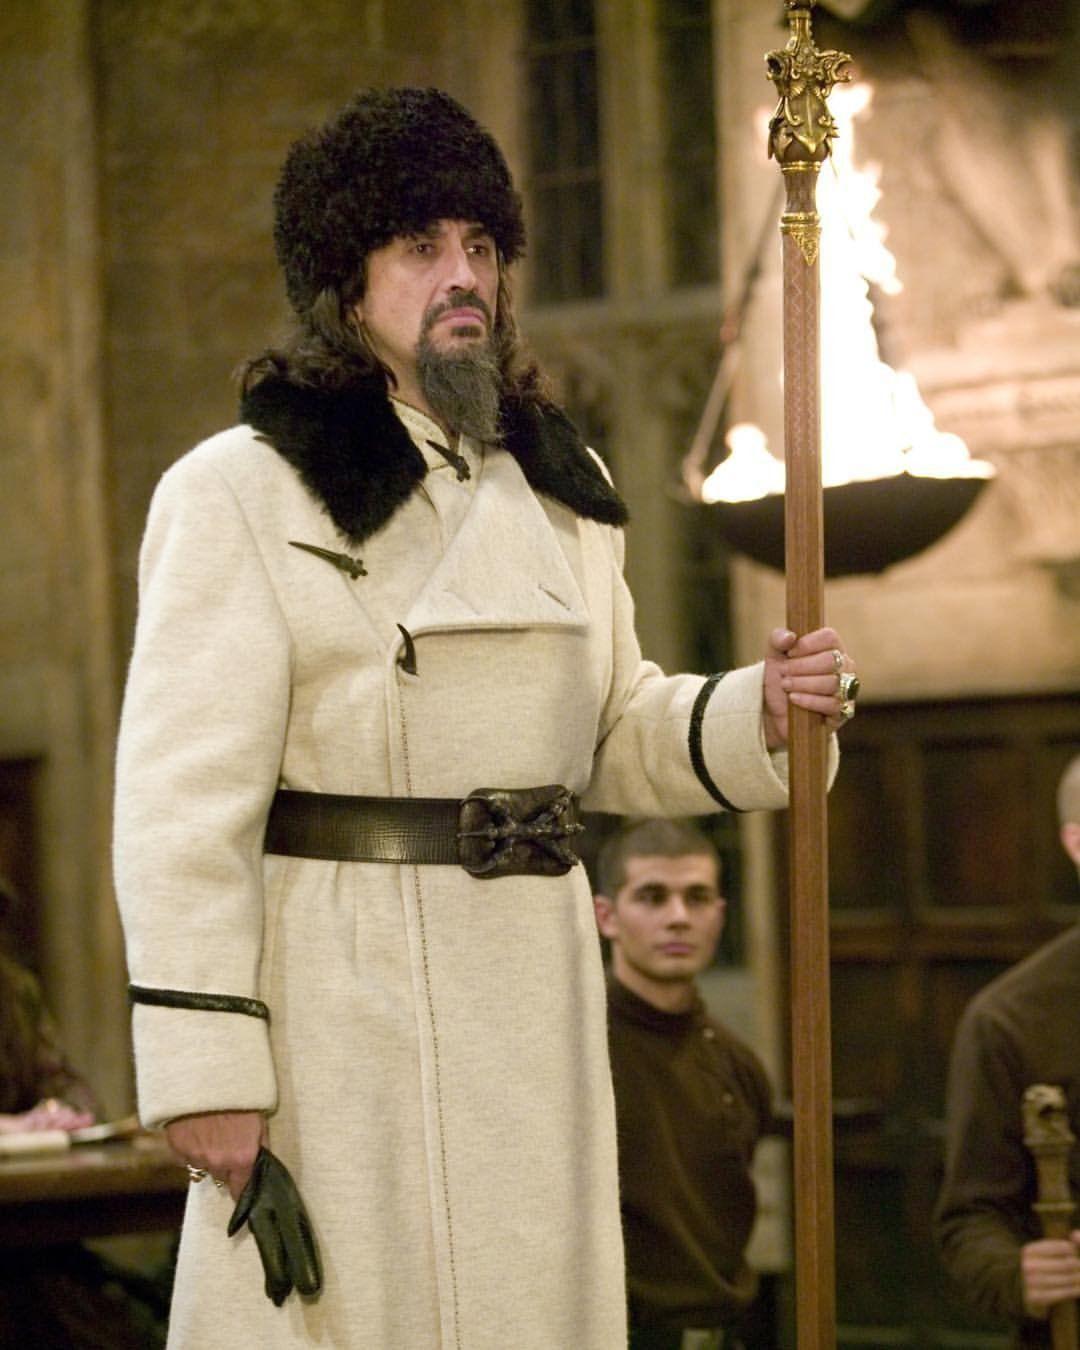 Igor Karkarov Albus Dumbledore Harry Potter Wiki Albus Dumbledore Harry Potter